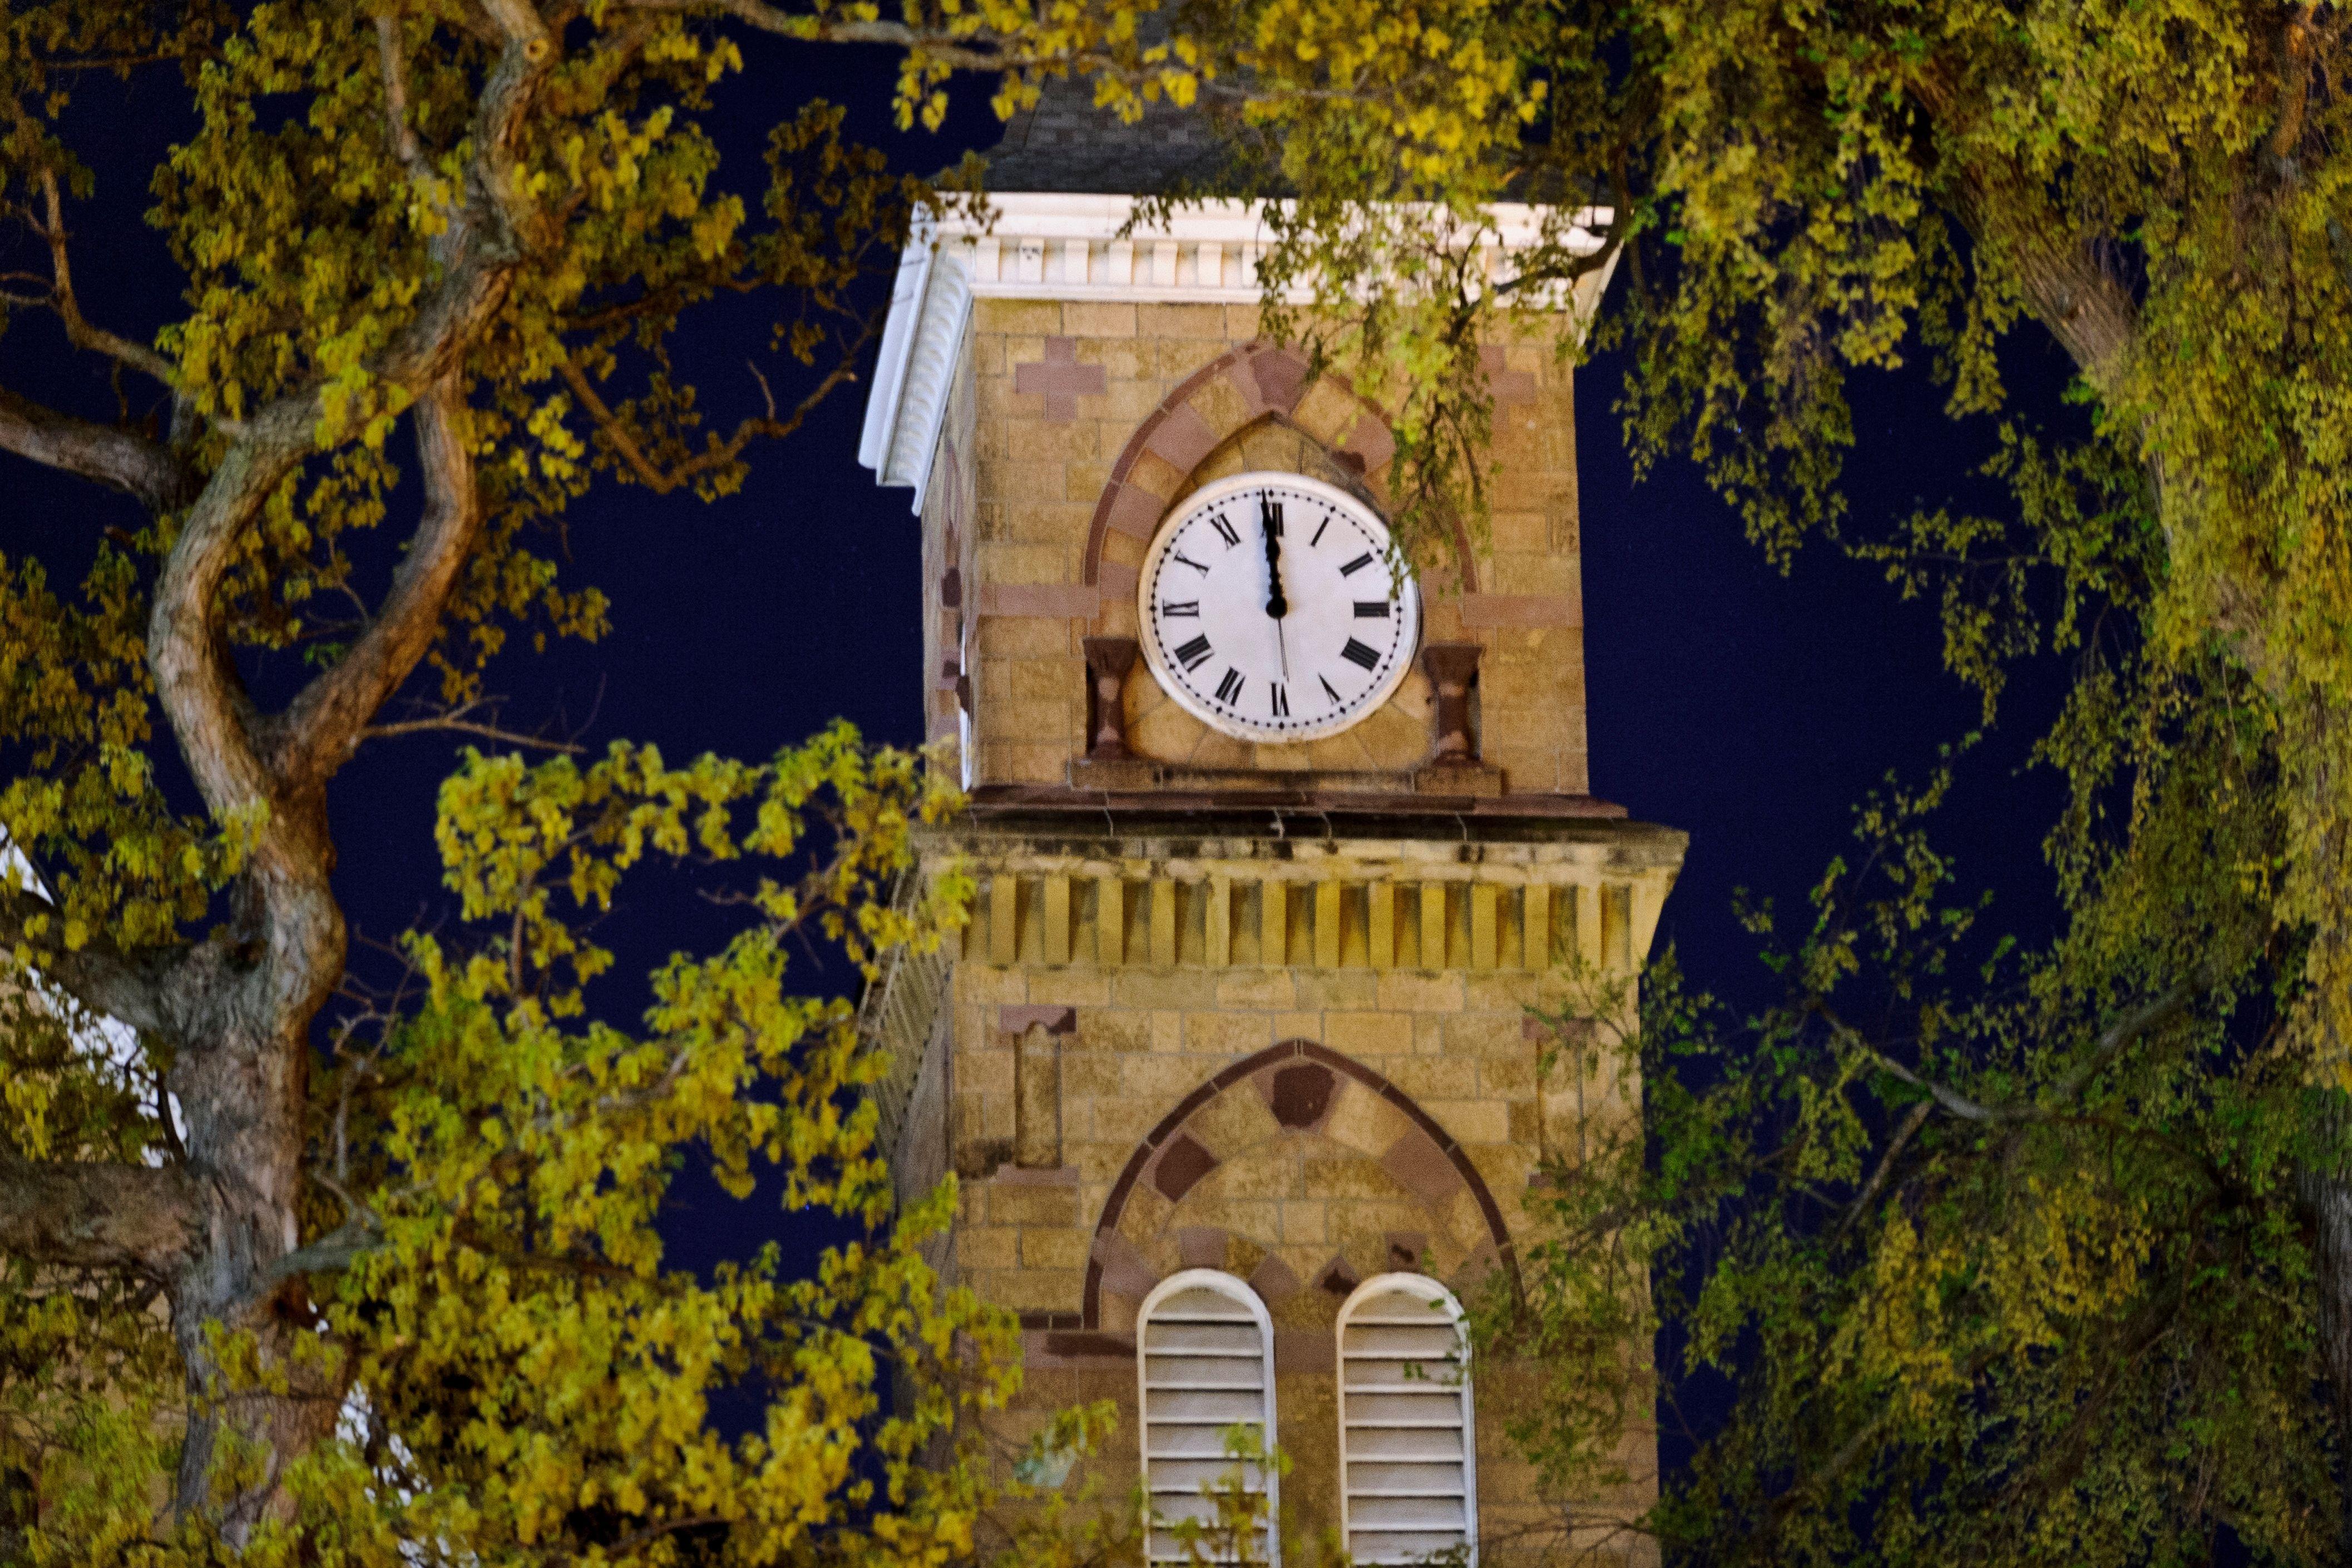 music hall clock at night